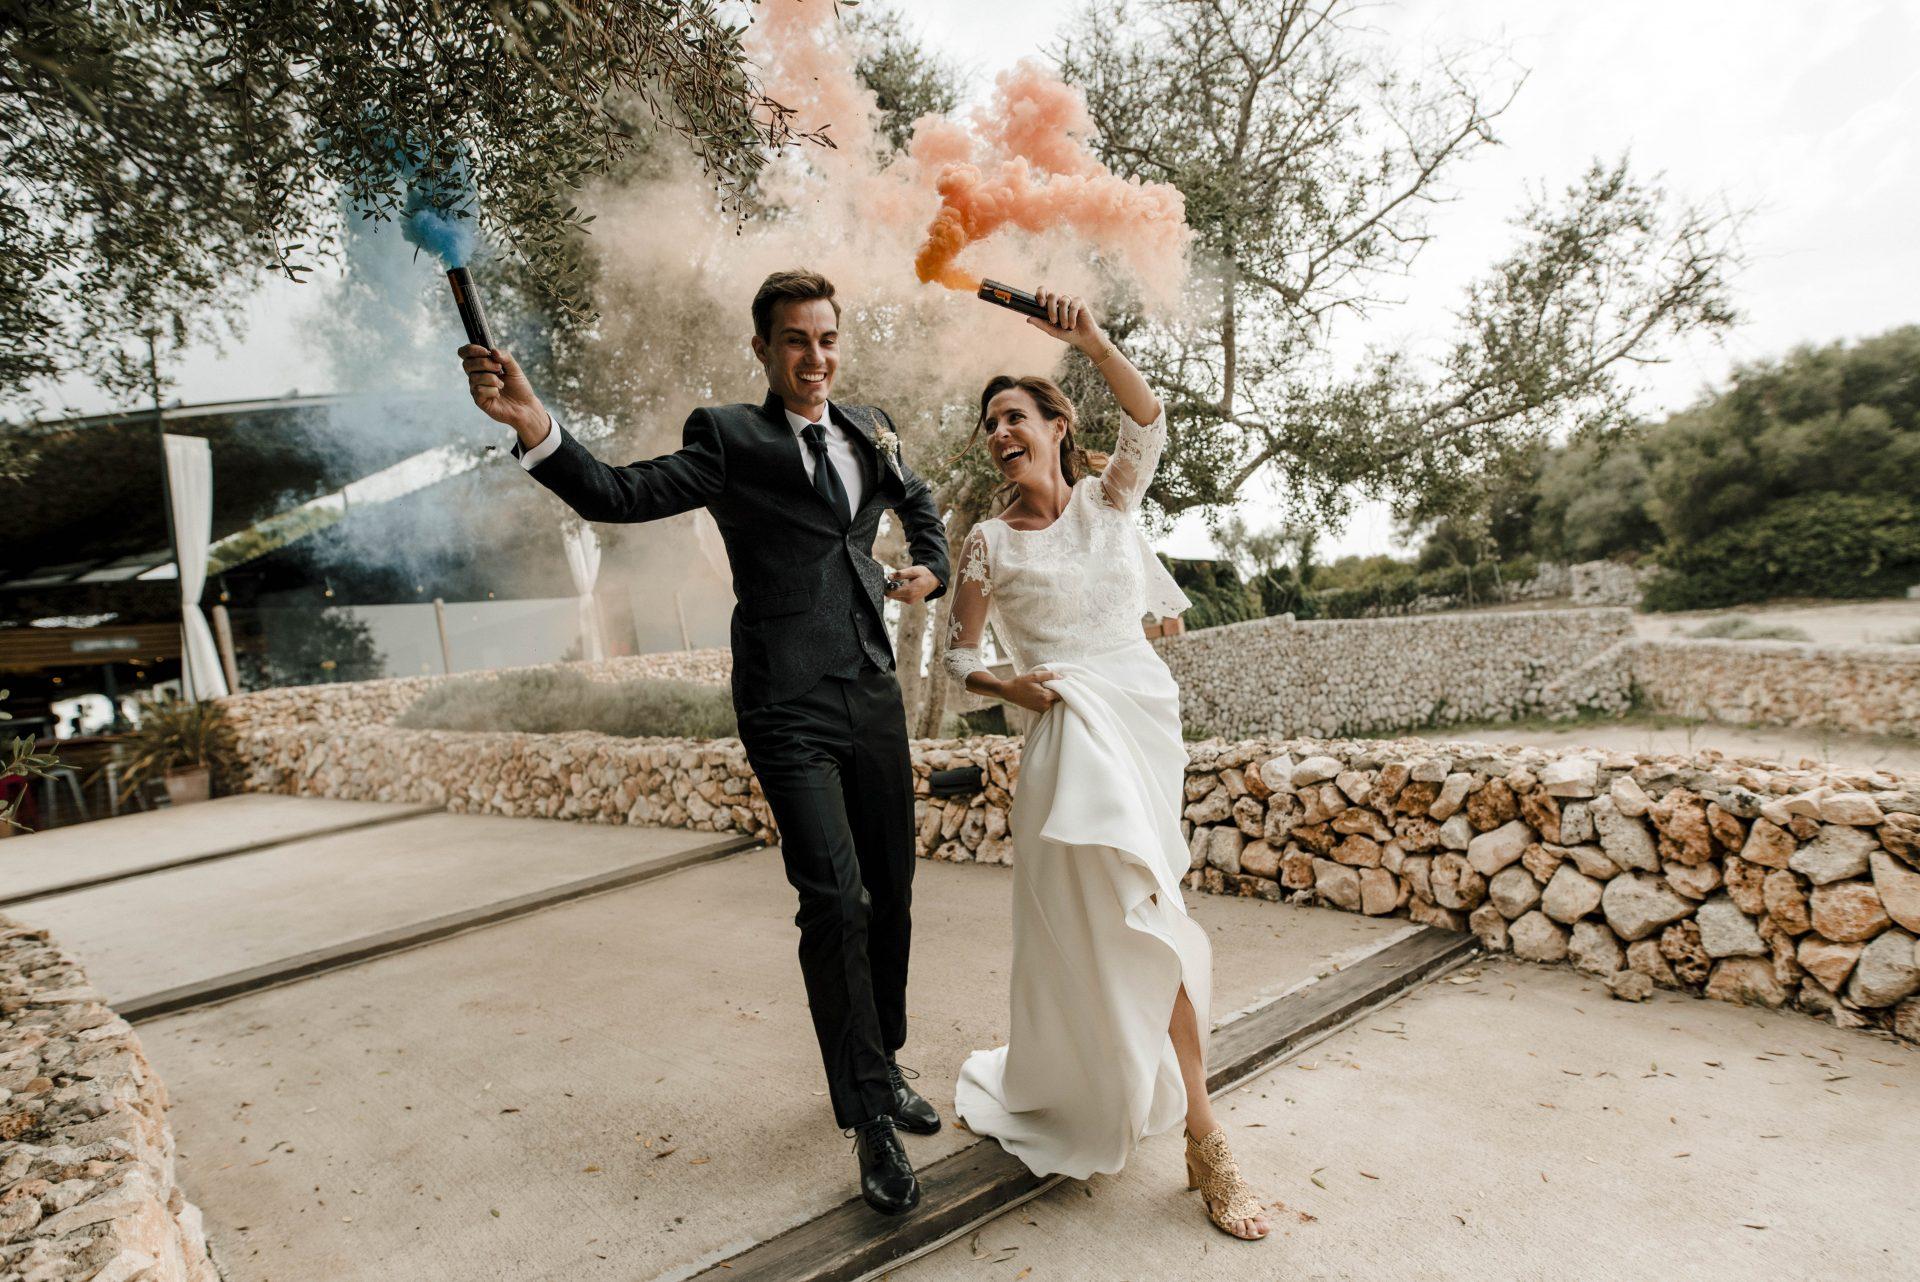 Wedding Photographer and Videographer at  Bodegas Binifadet in Menorca